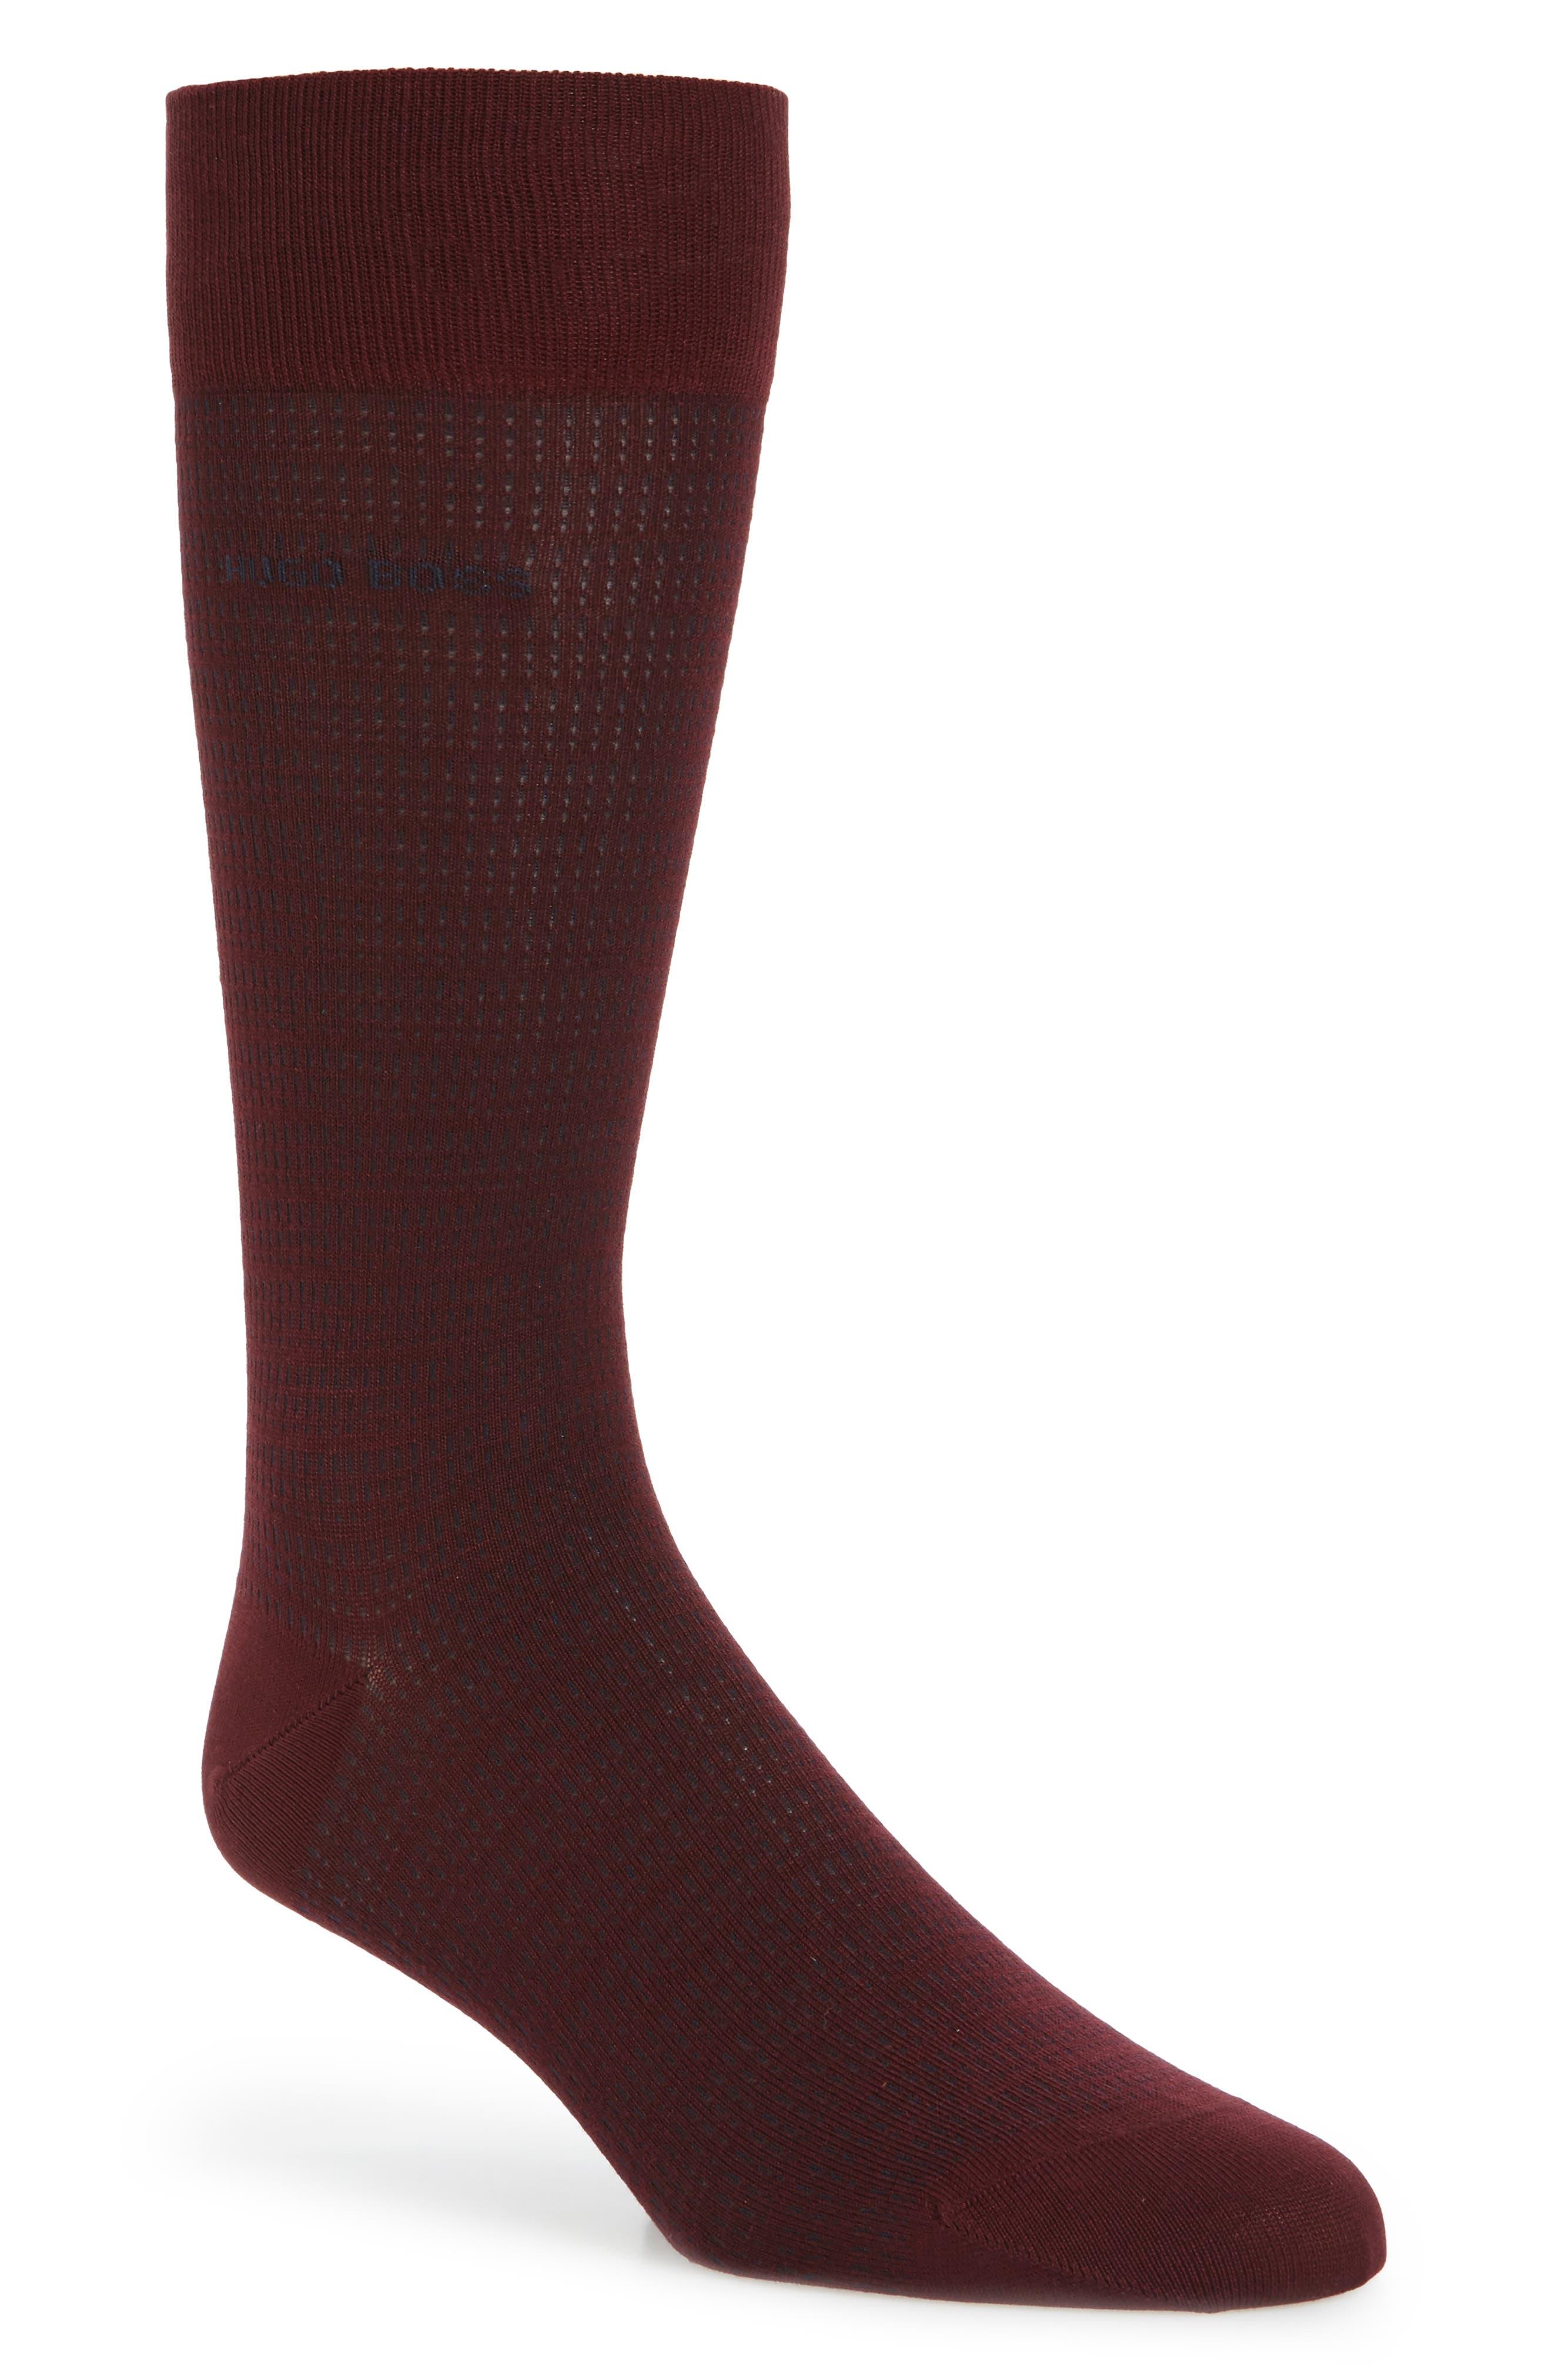 Micro Jacquard Socks,                             Main thumbnail 1, color,                             Dark Red